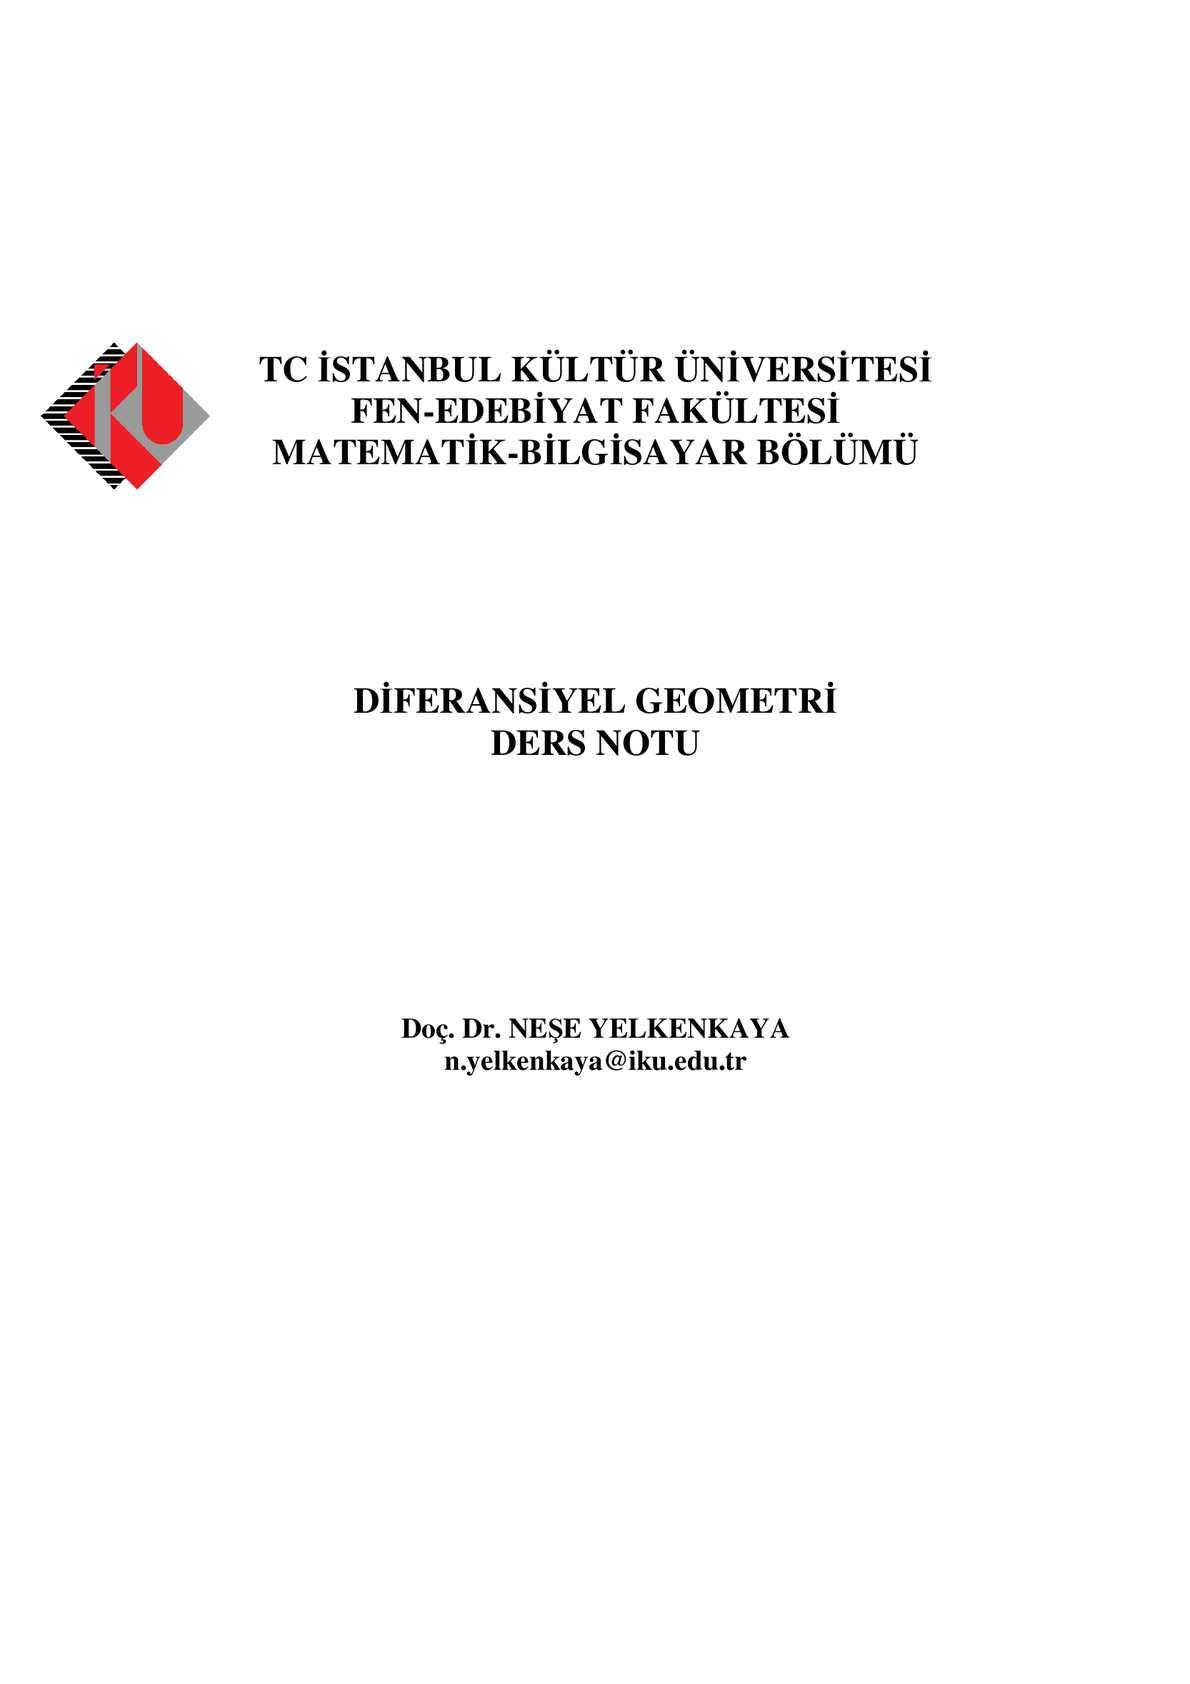 Diferansiyel Geometri (Doç.Dr. Neşe Yelkenkaya) - İKÜ